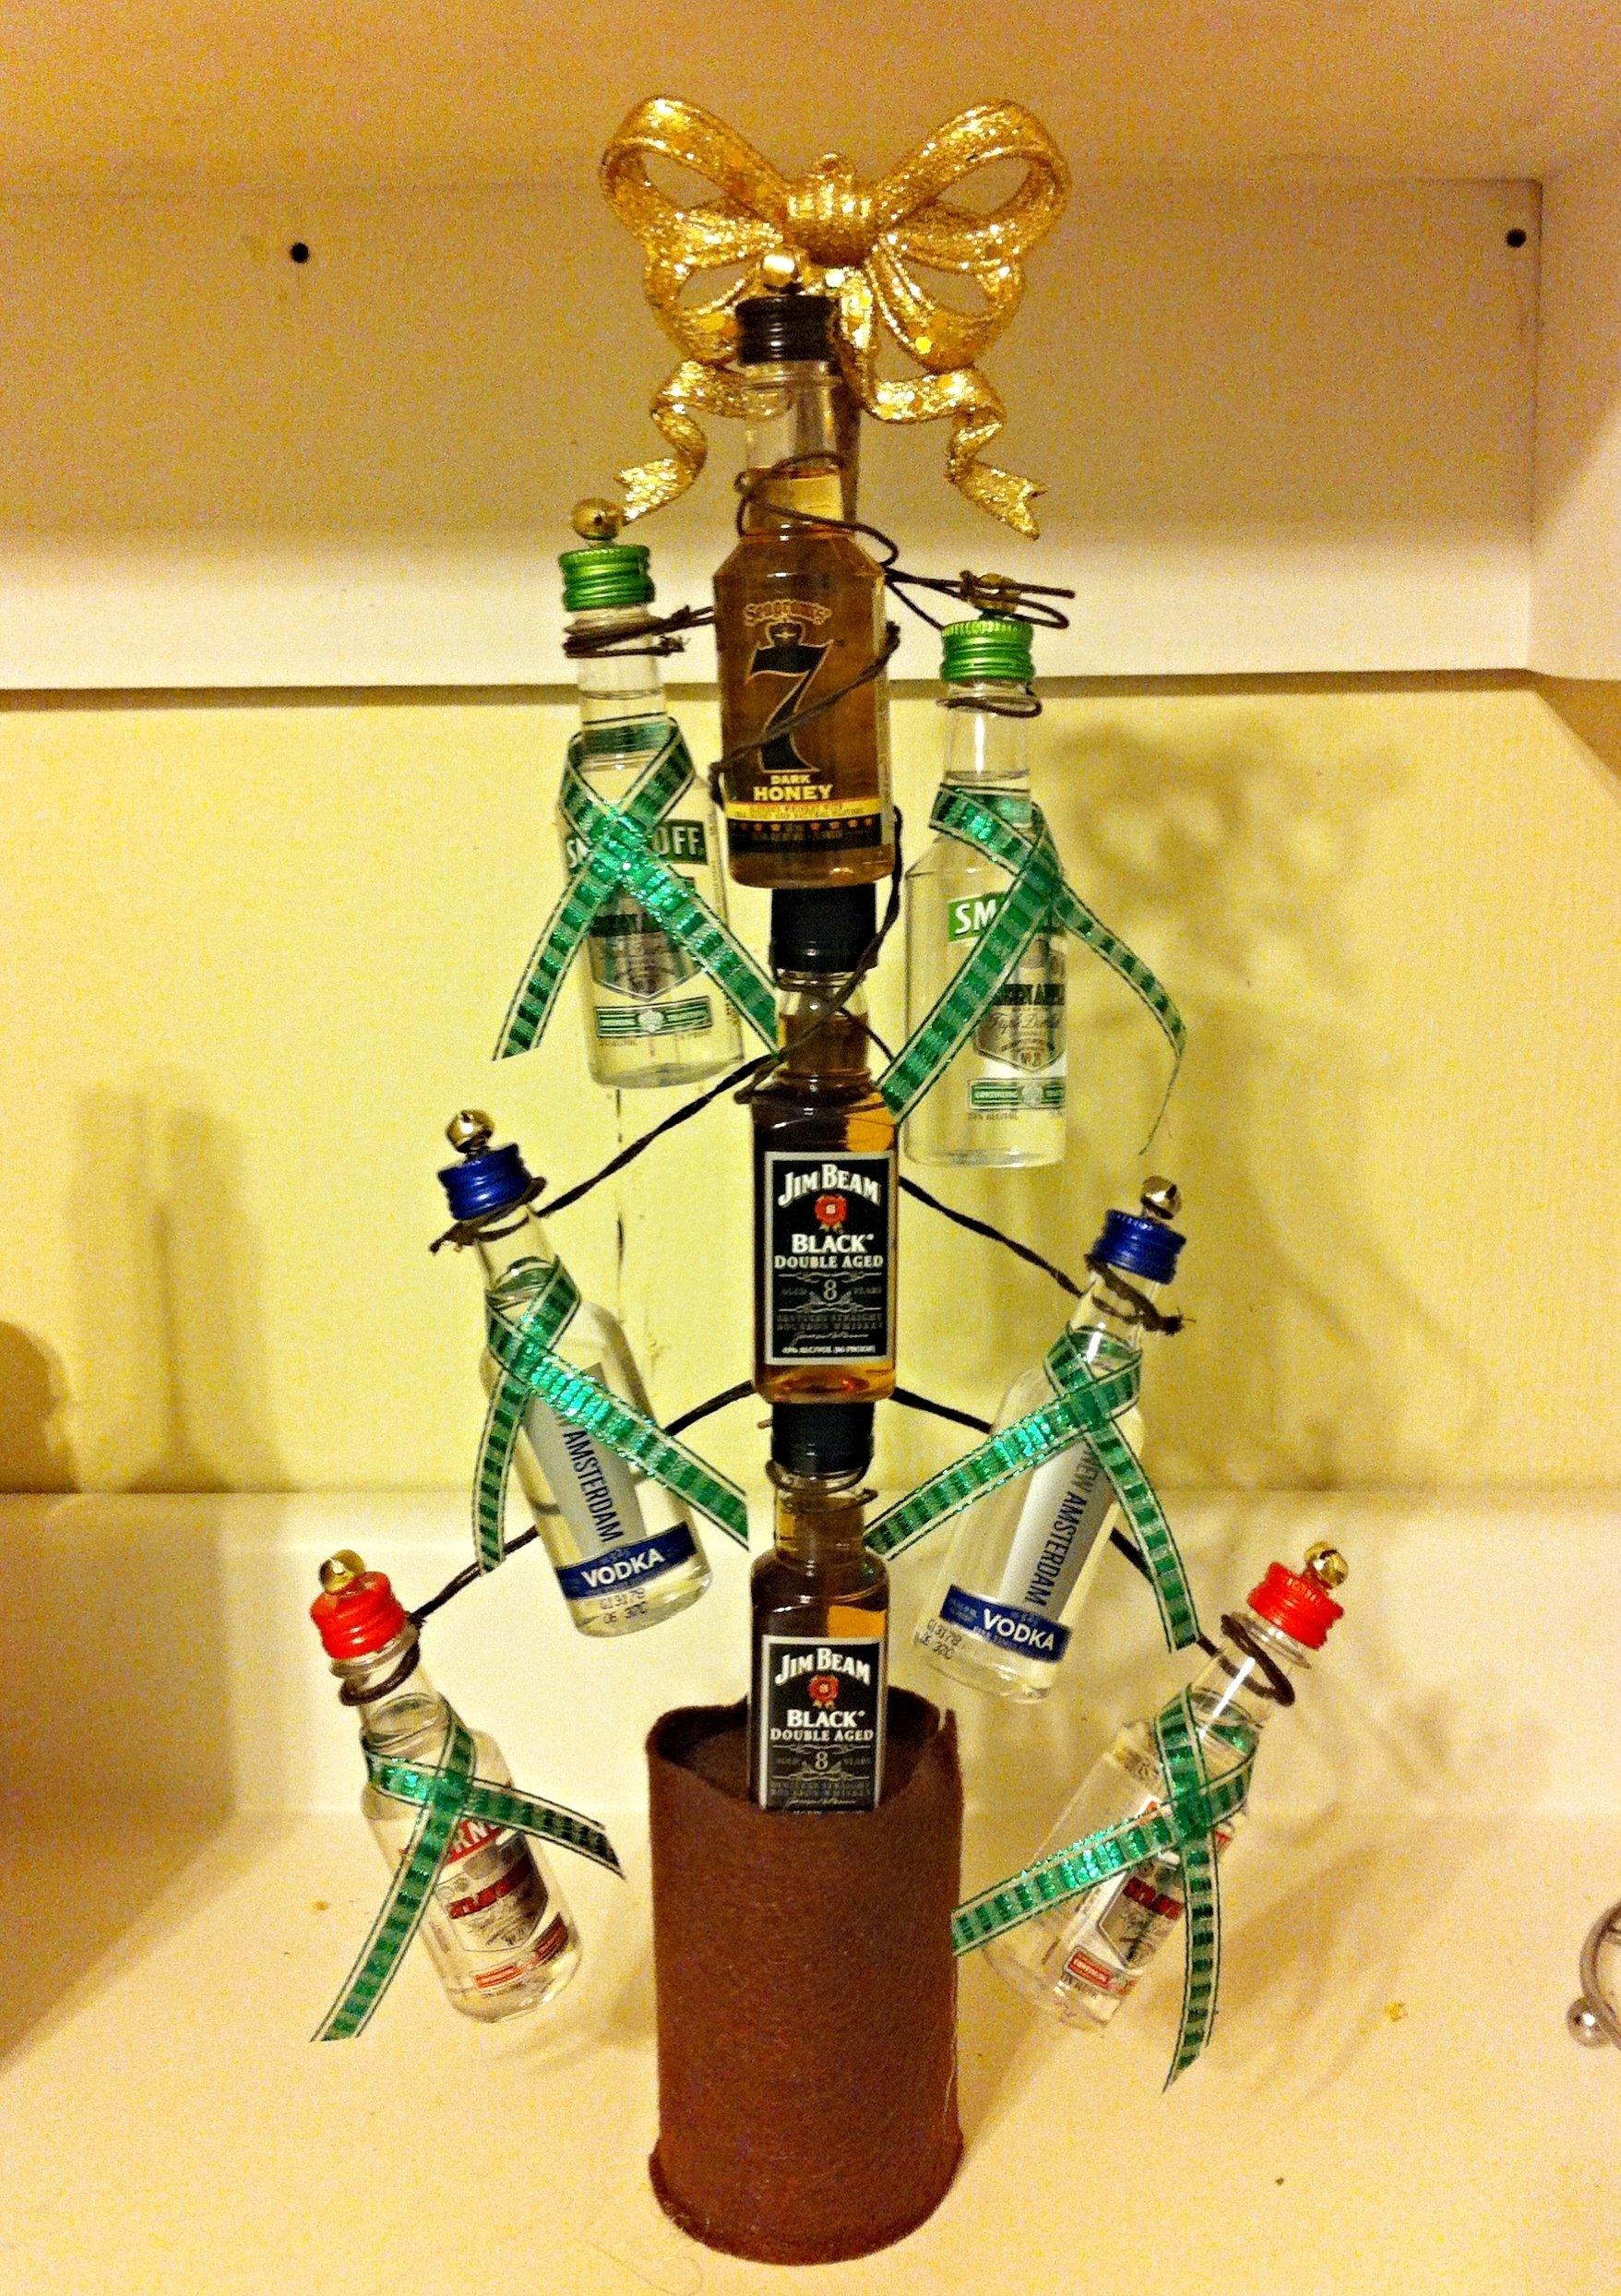 10 Stylish Ideas For Yankee Swap Gifts diy yankee swap gift 15 limit nip christmas tree holiday stuff 2021